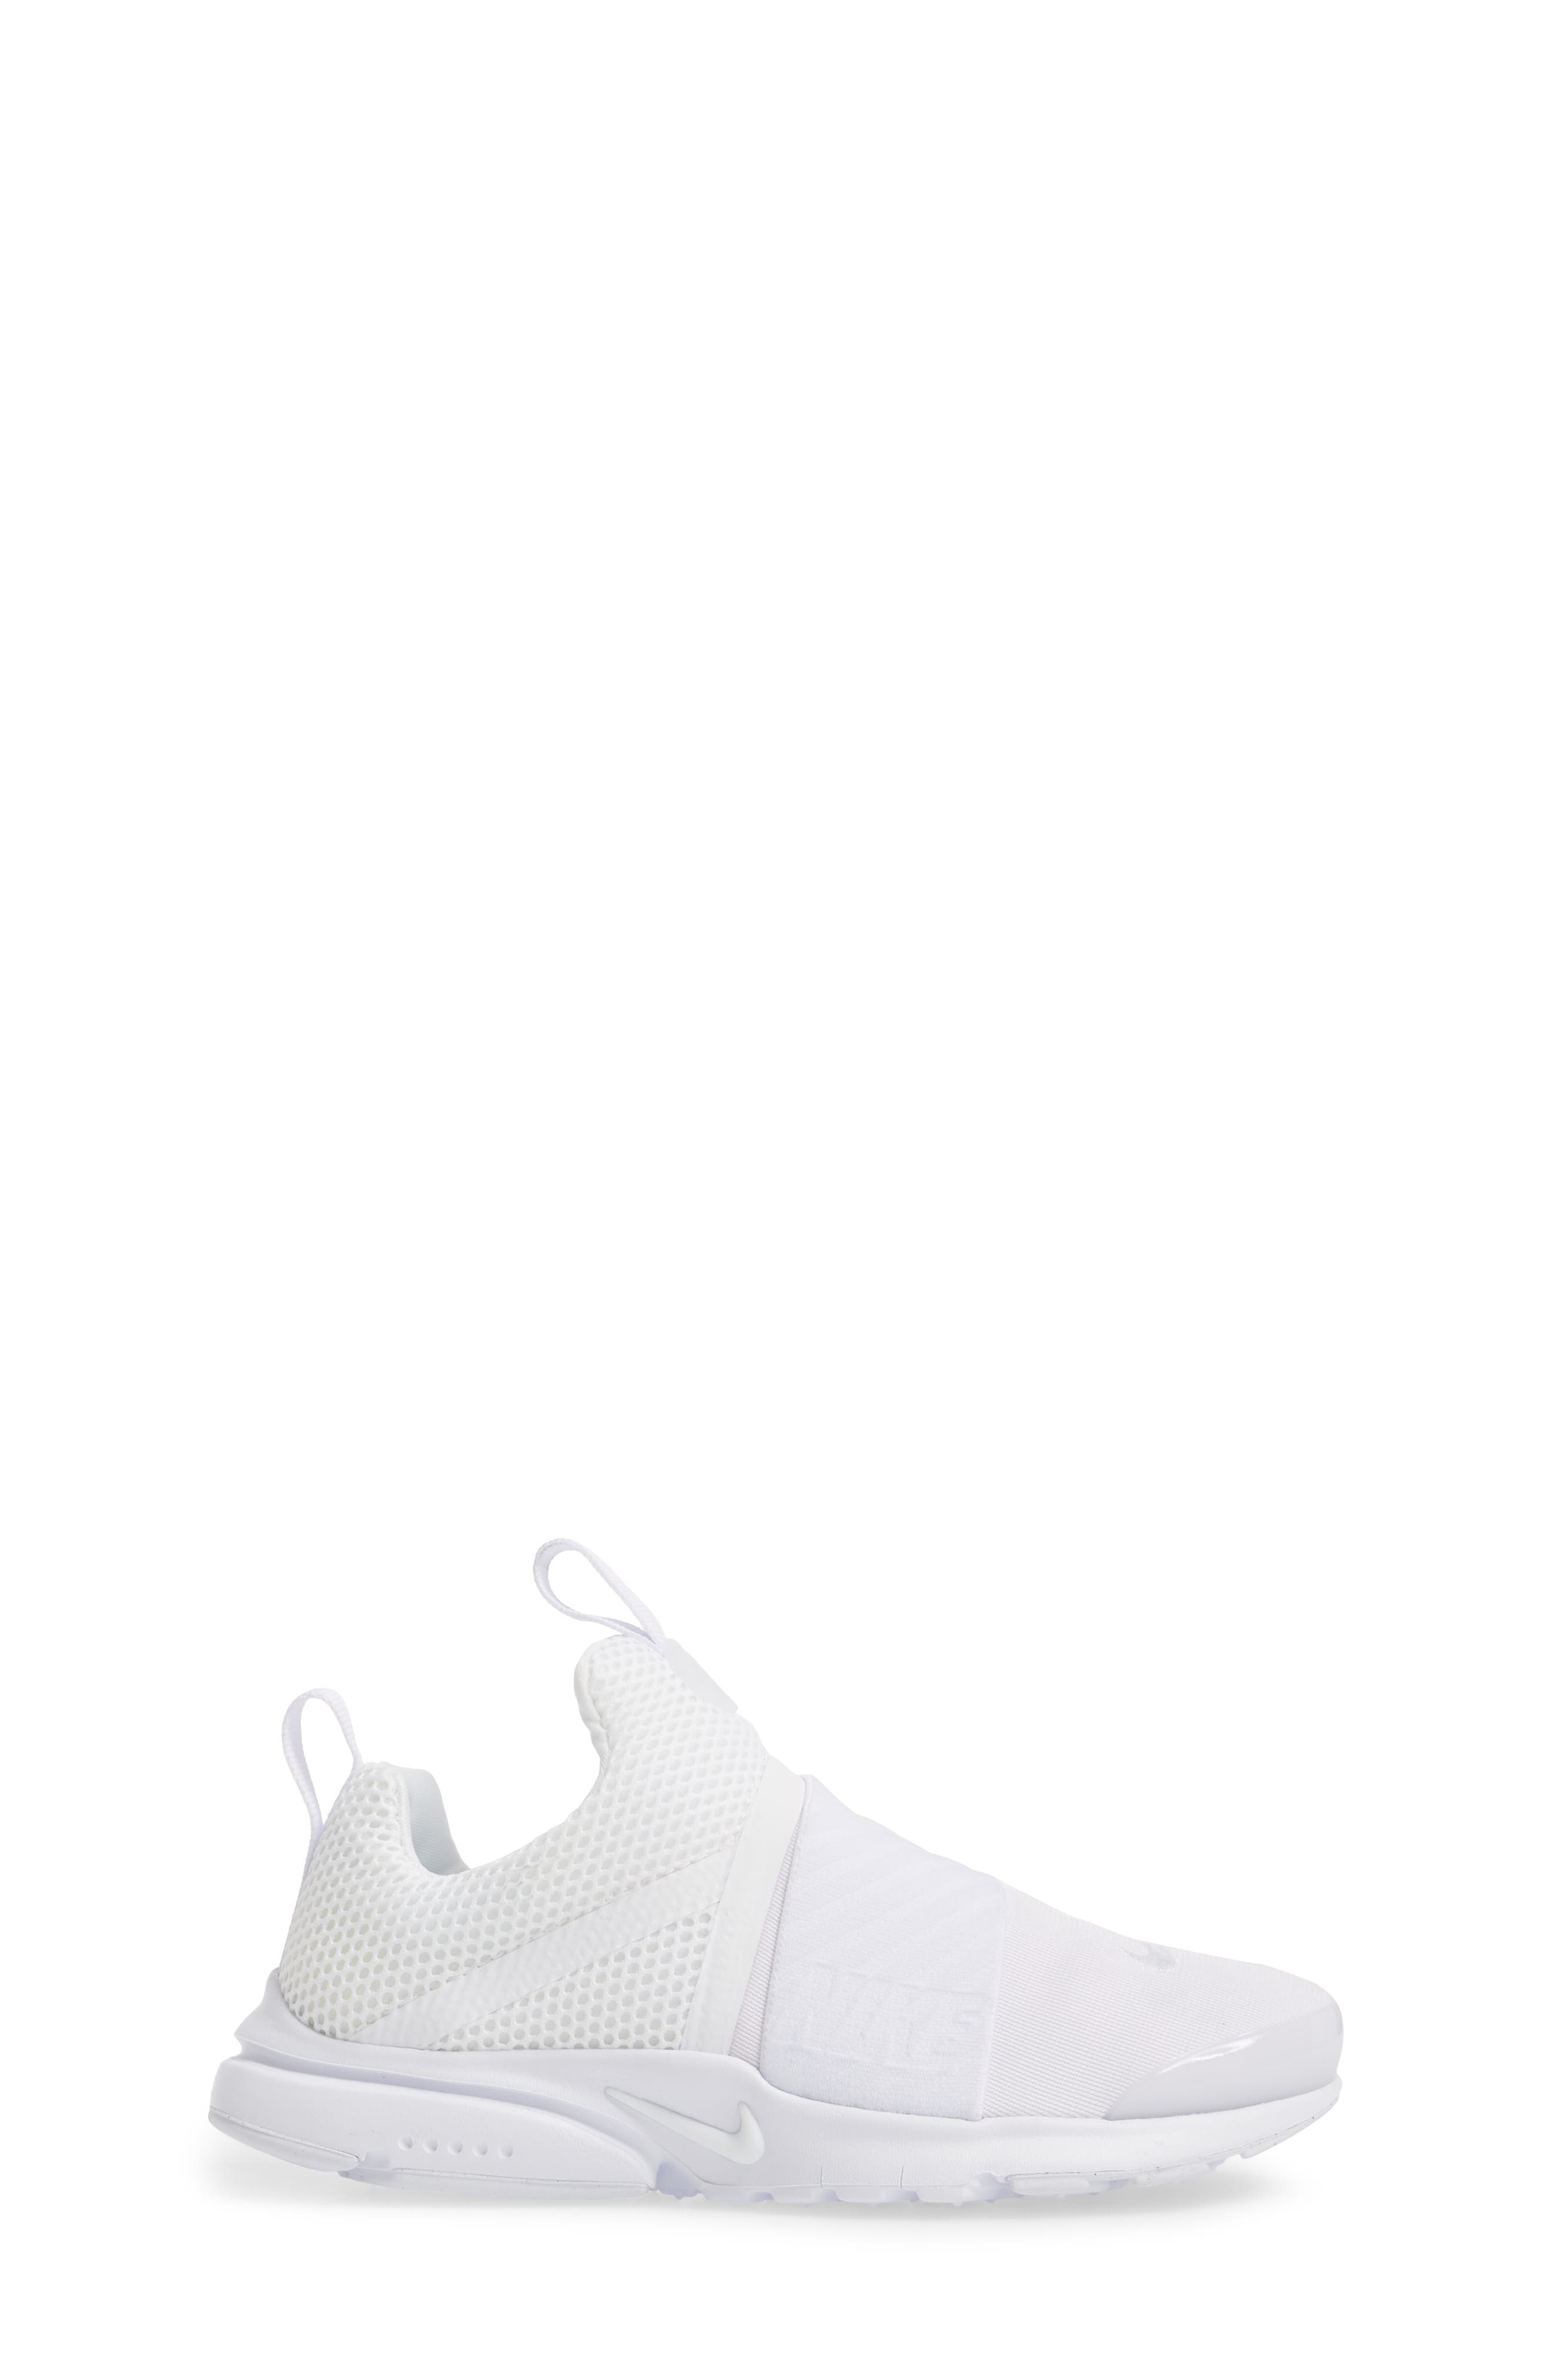 Presto Extreme Sneaker,                             Alternate thumbnail 26, color,